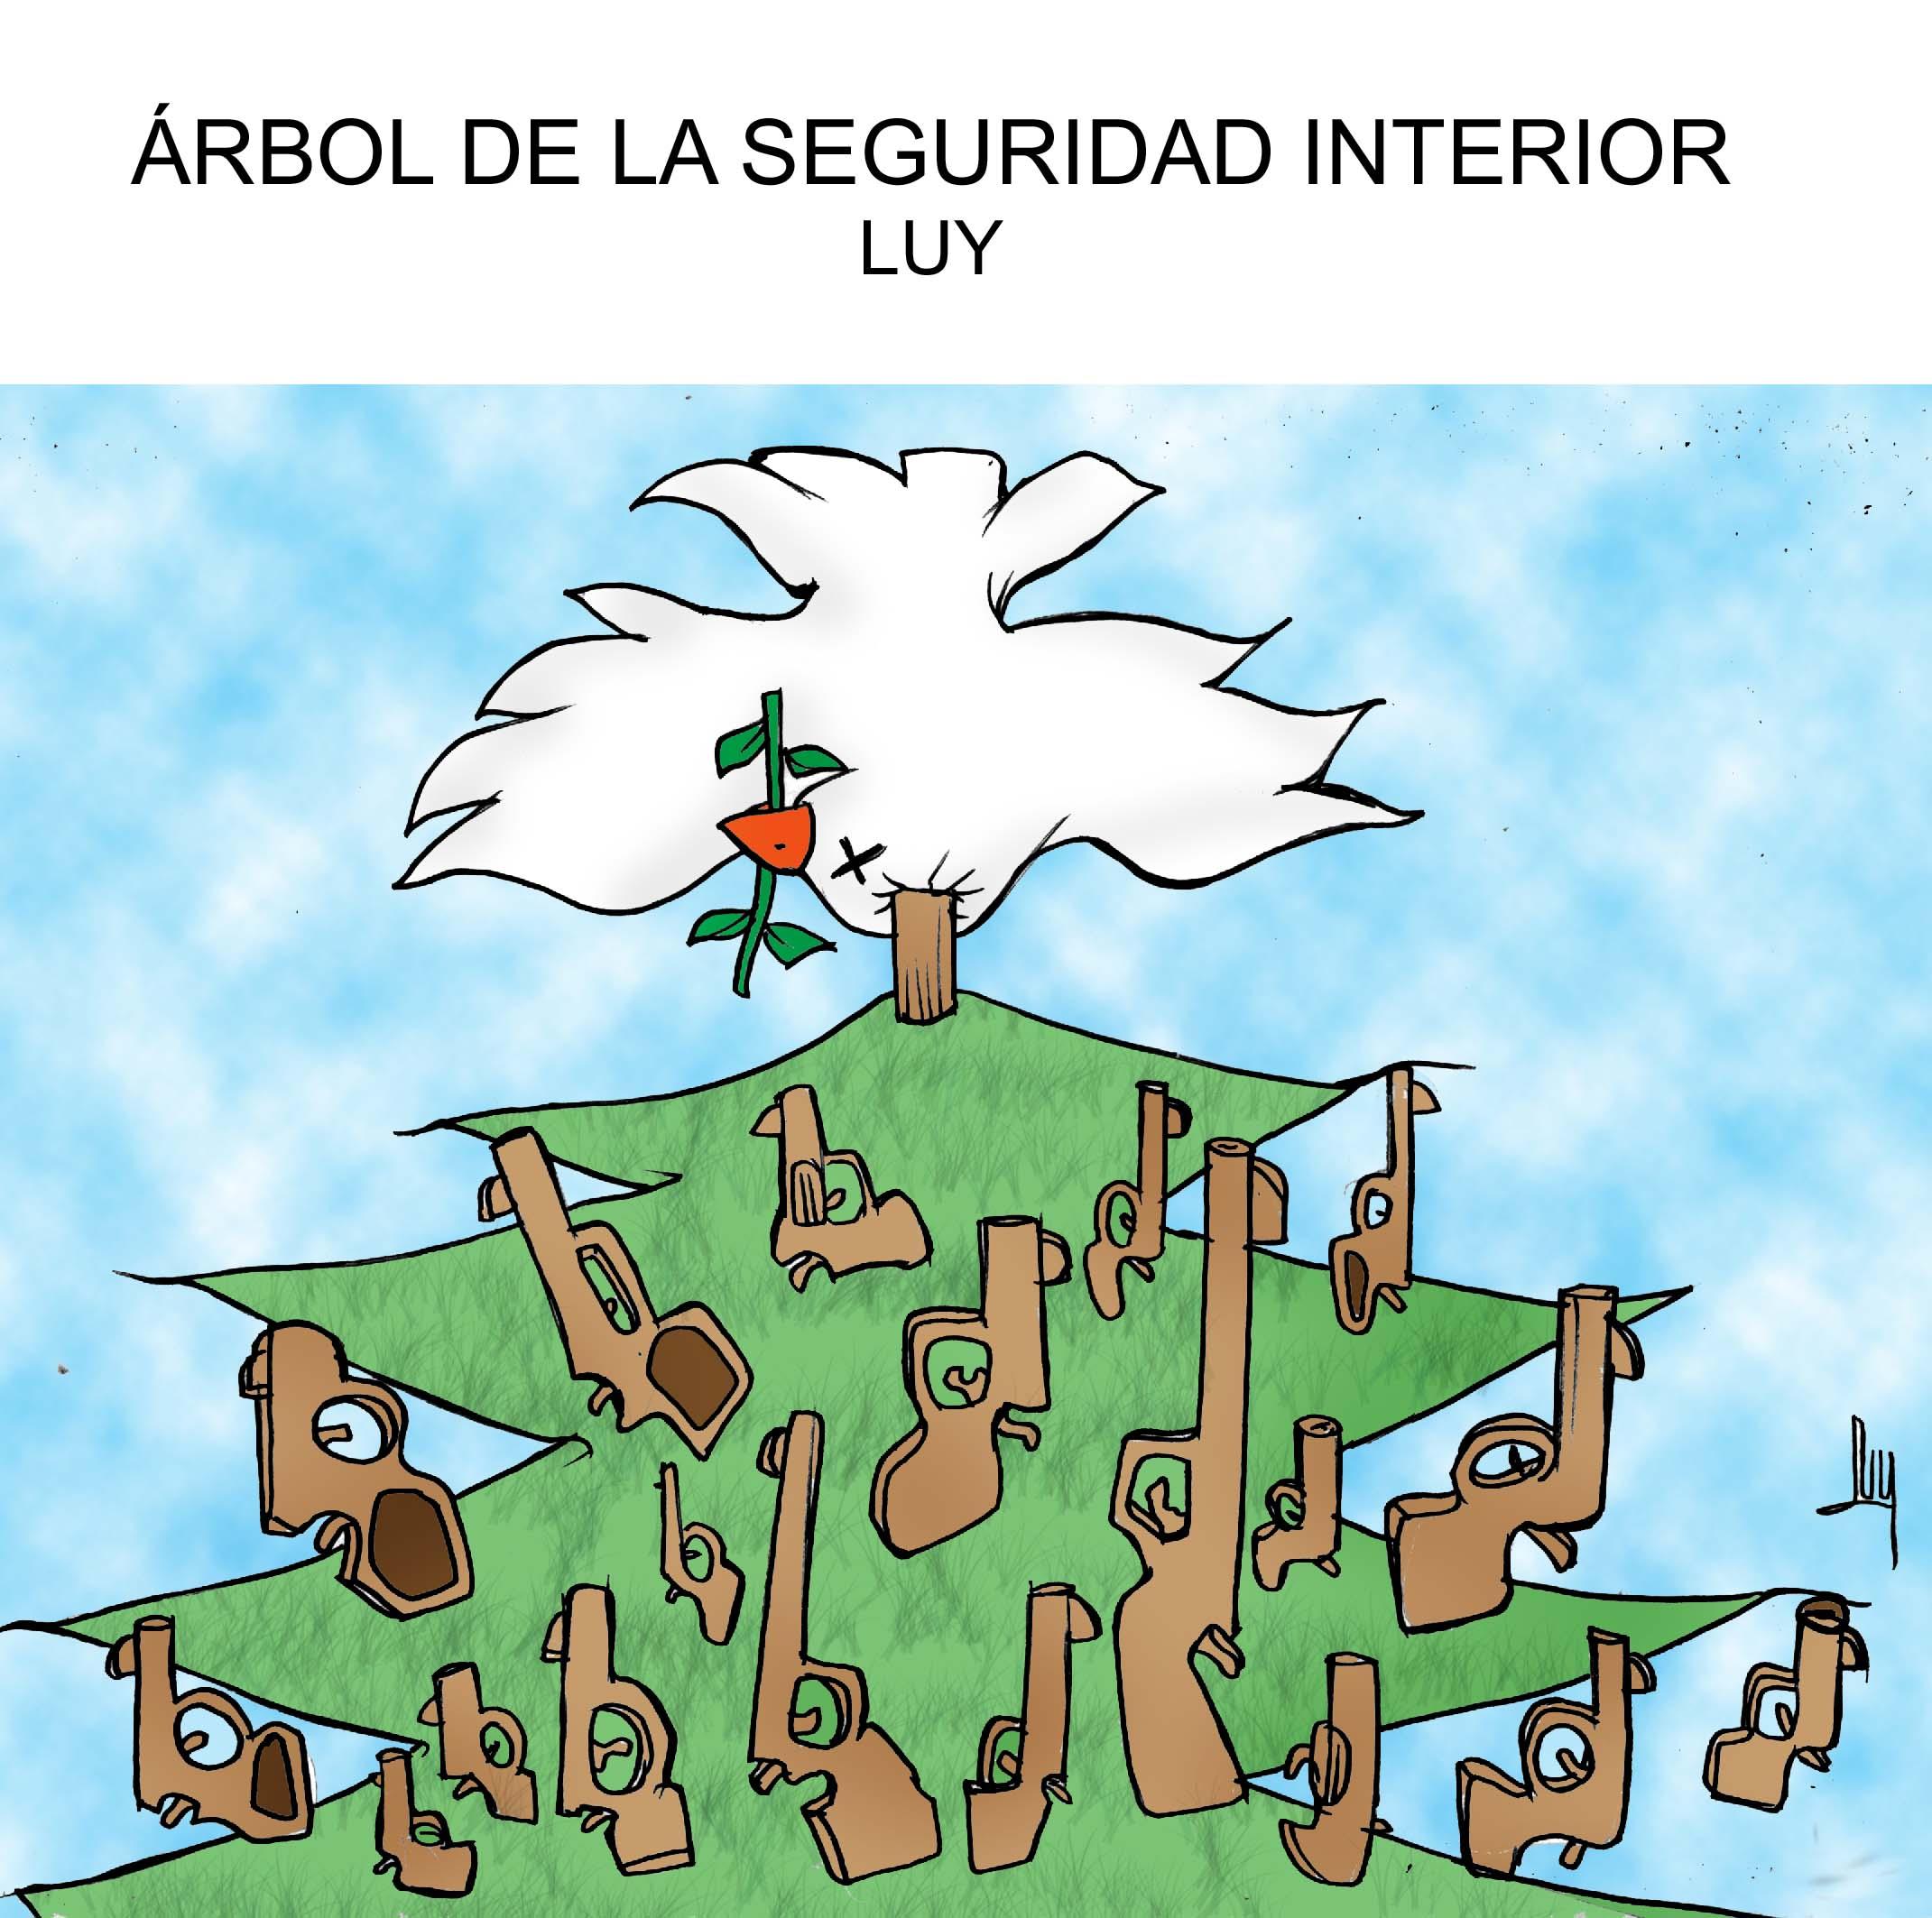 arbol-seguridad-interior